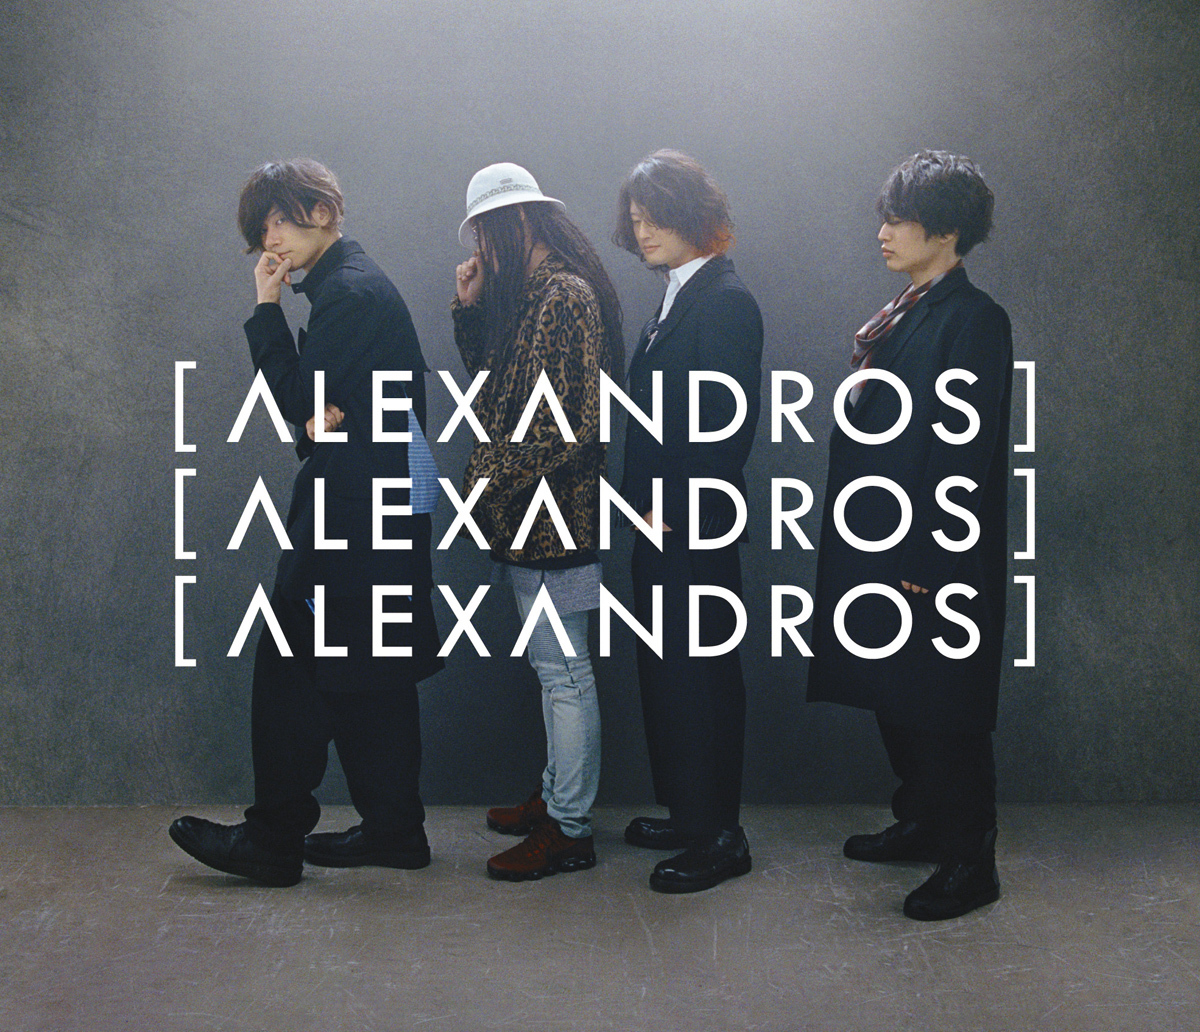 [Alexandros]「明日、また」限定盤